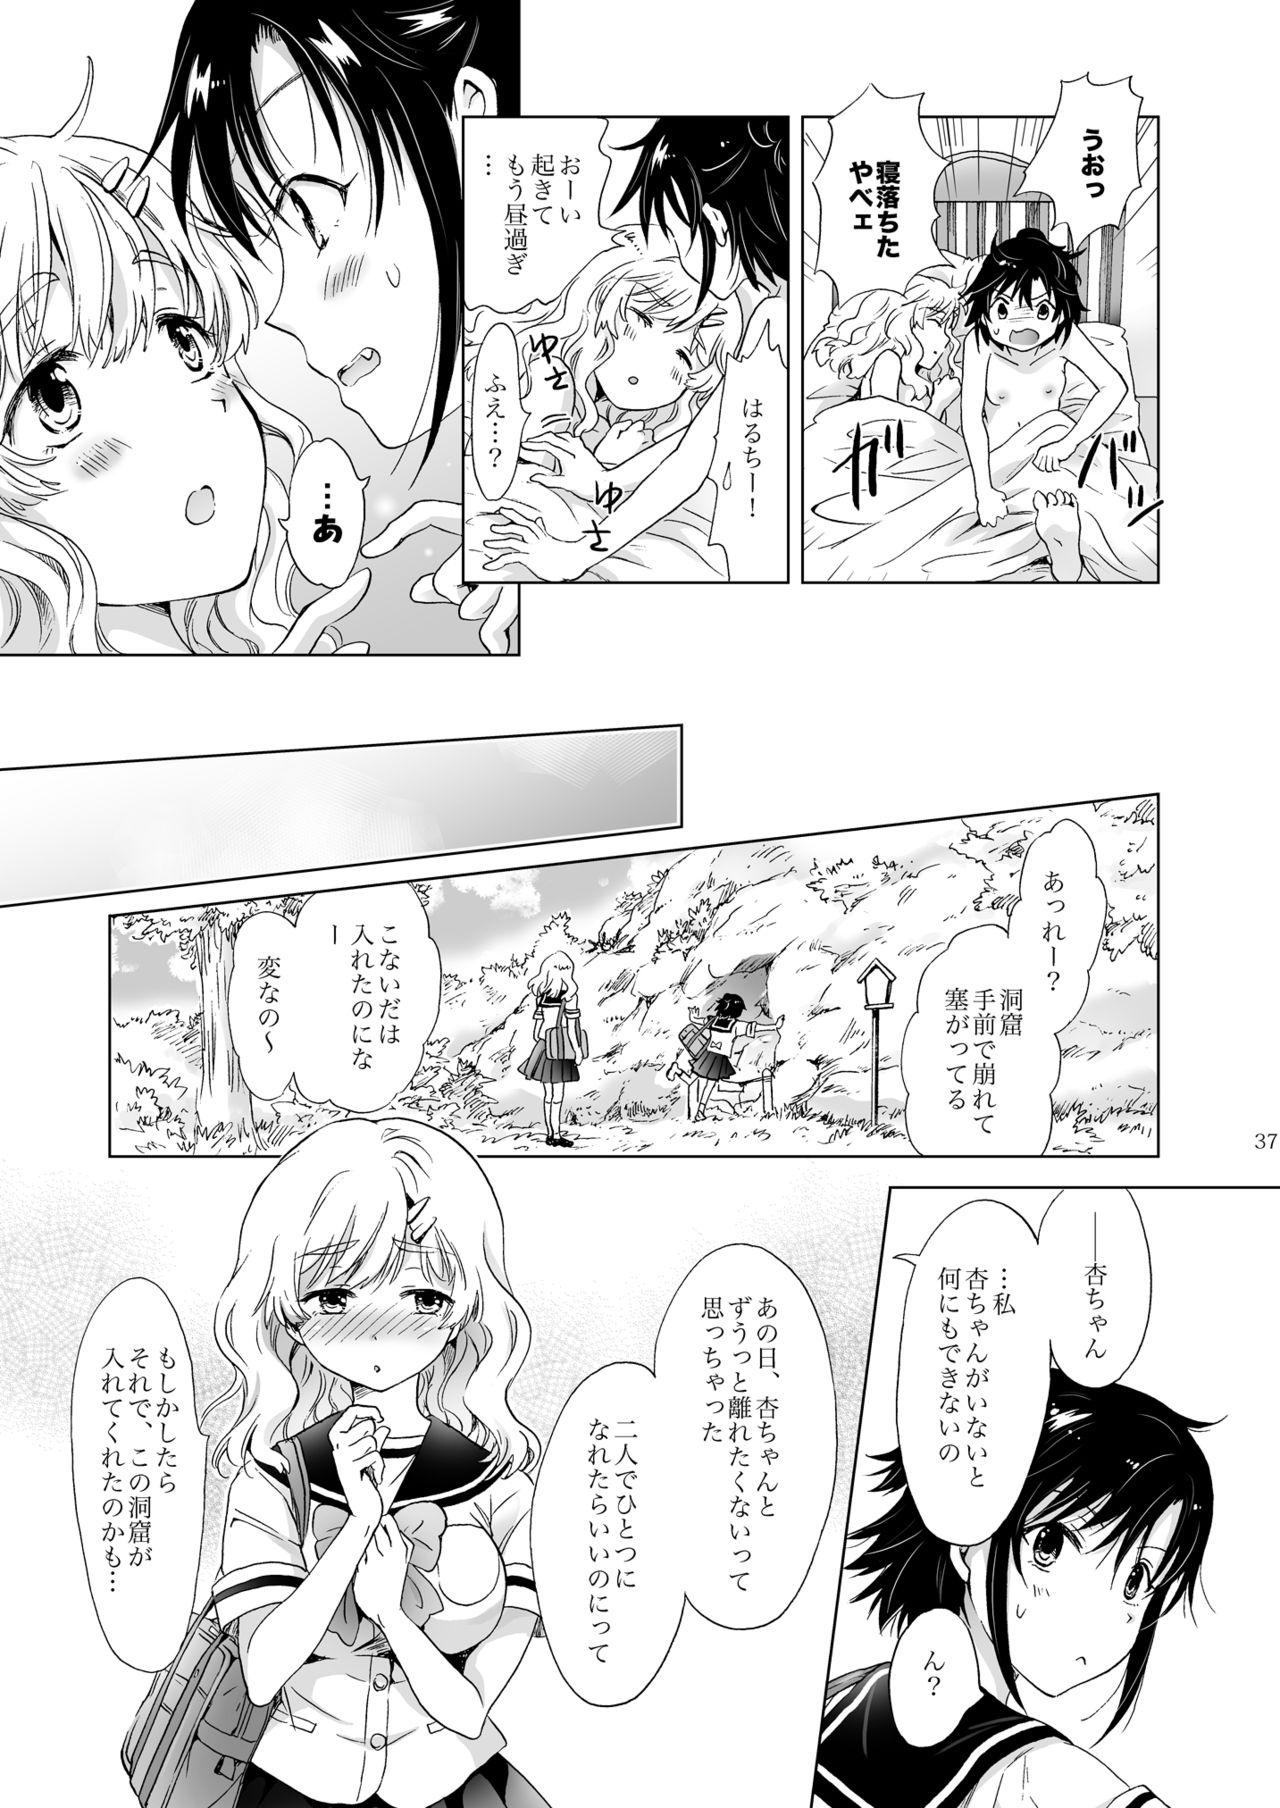 [peachpulsar (Mira)] Oppai-chan to chippai-chan ga irekawaru hanashi [Digital] 35